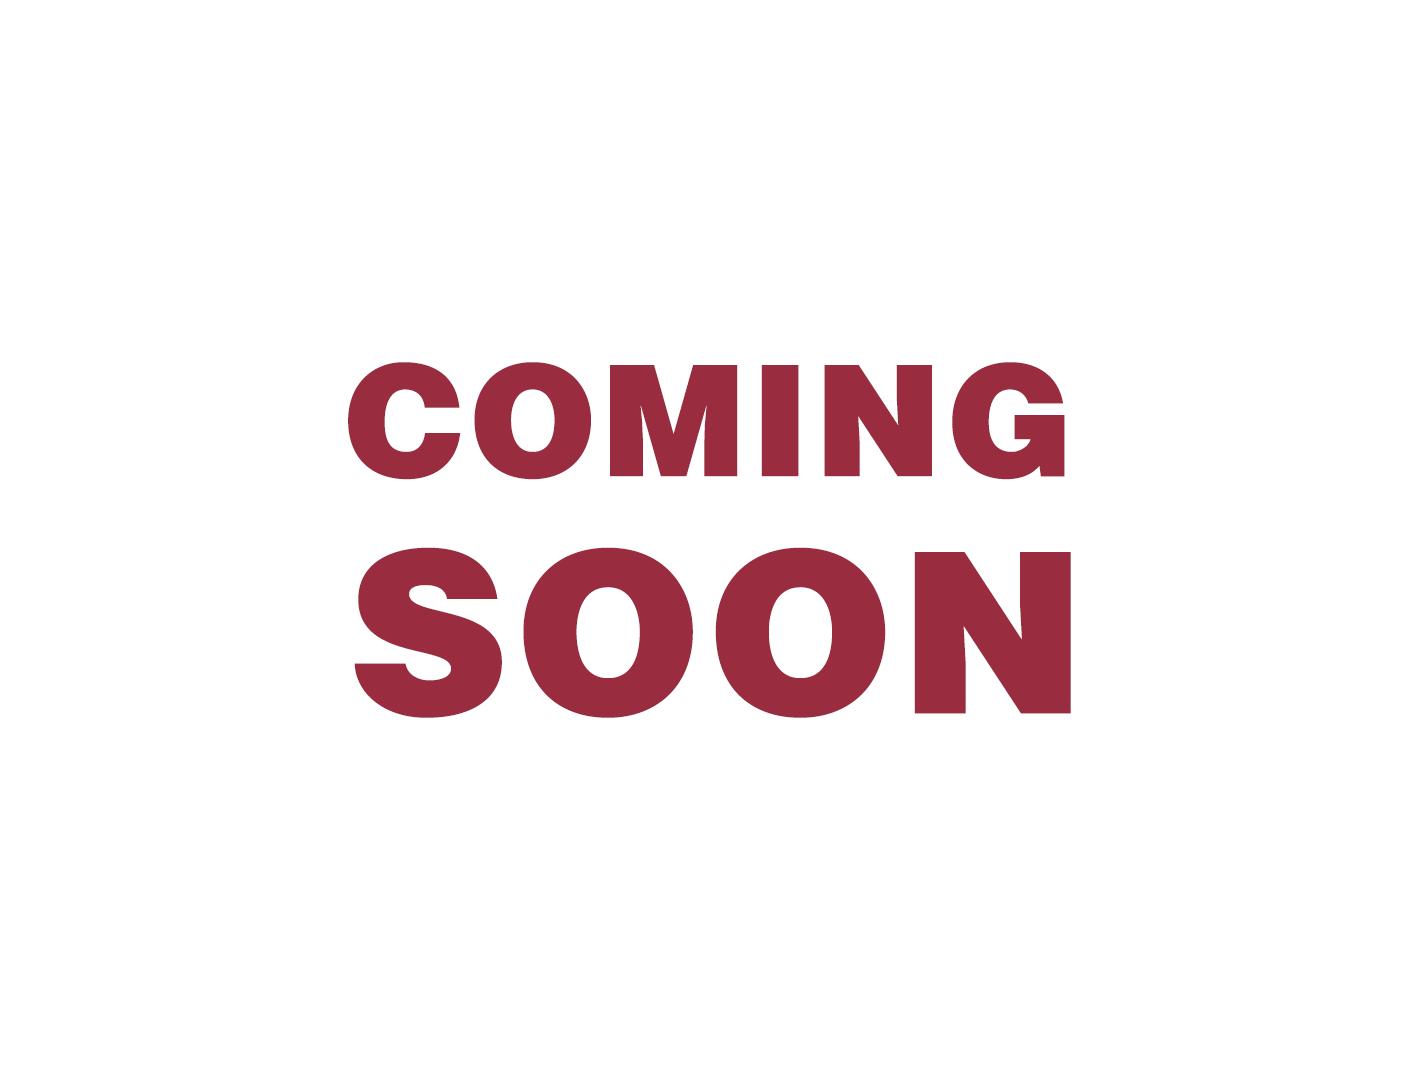 coming soon_Web icon